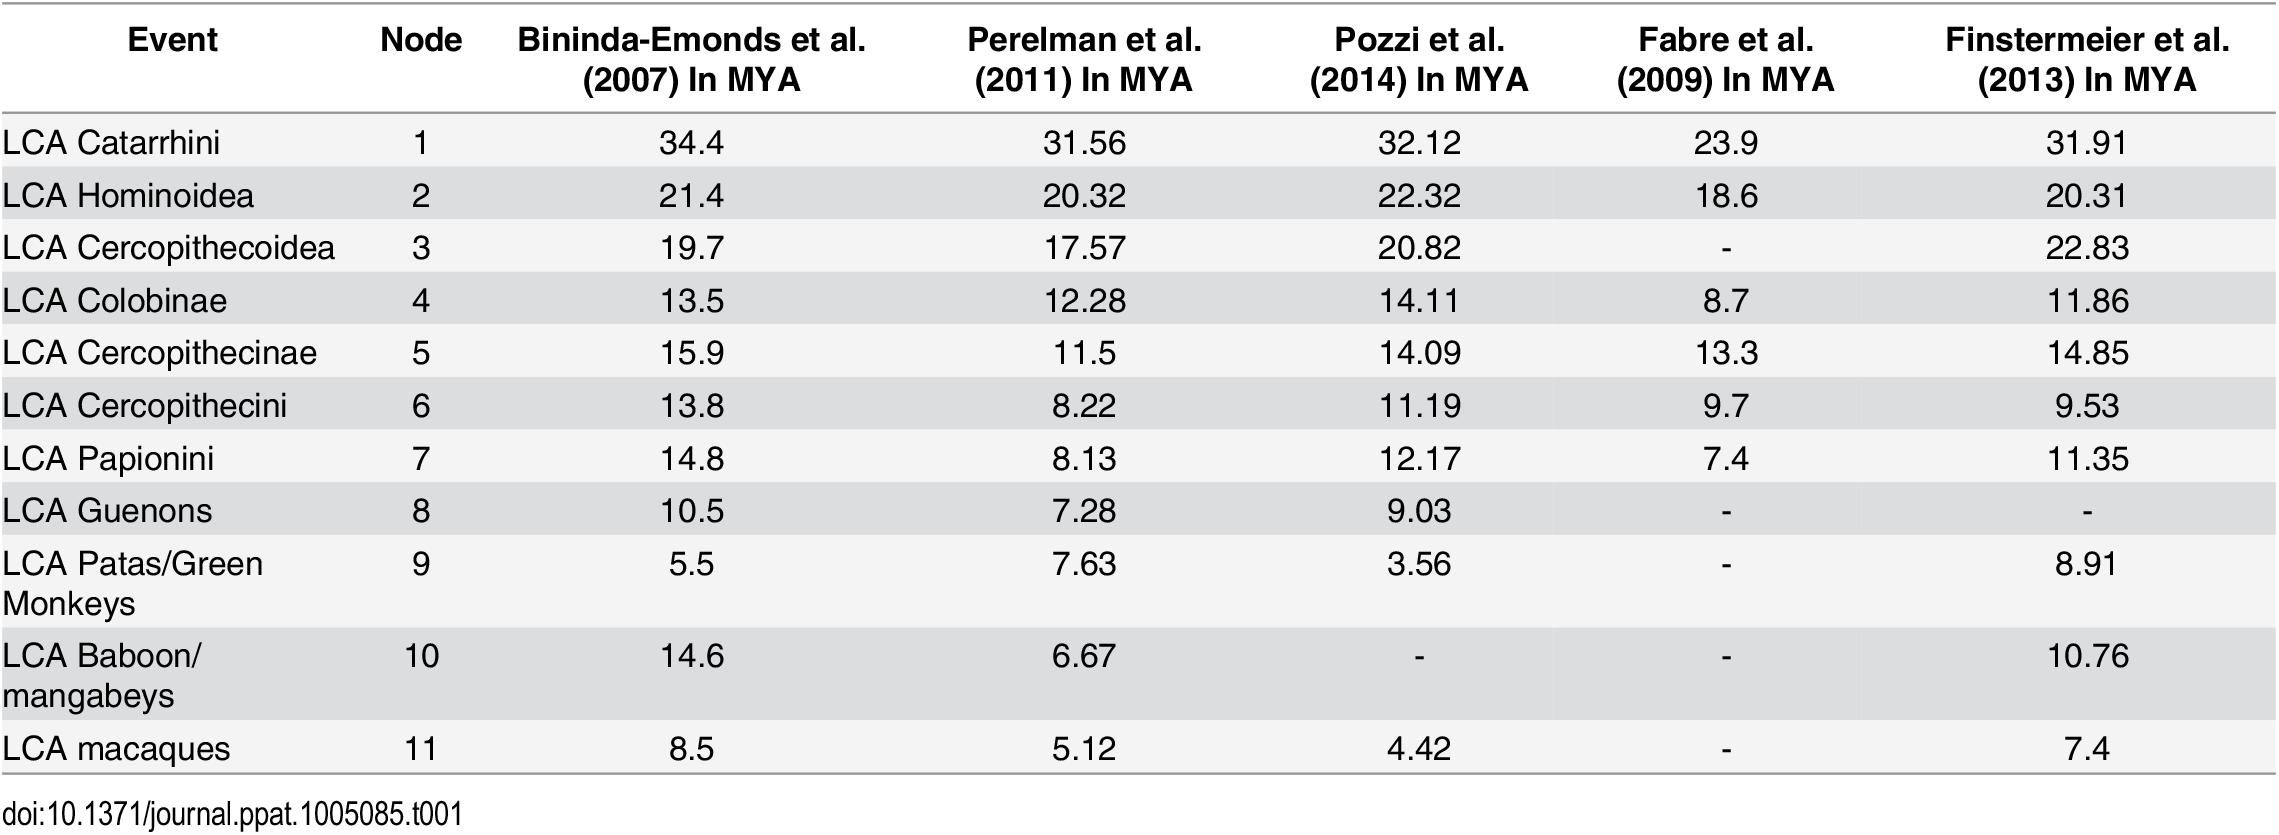 Estimated dates for nodes of interest.